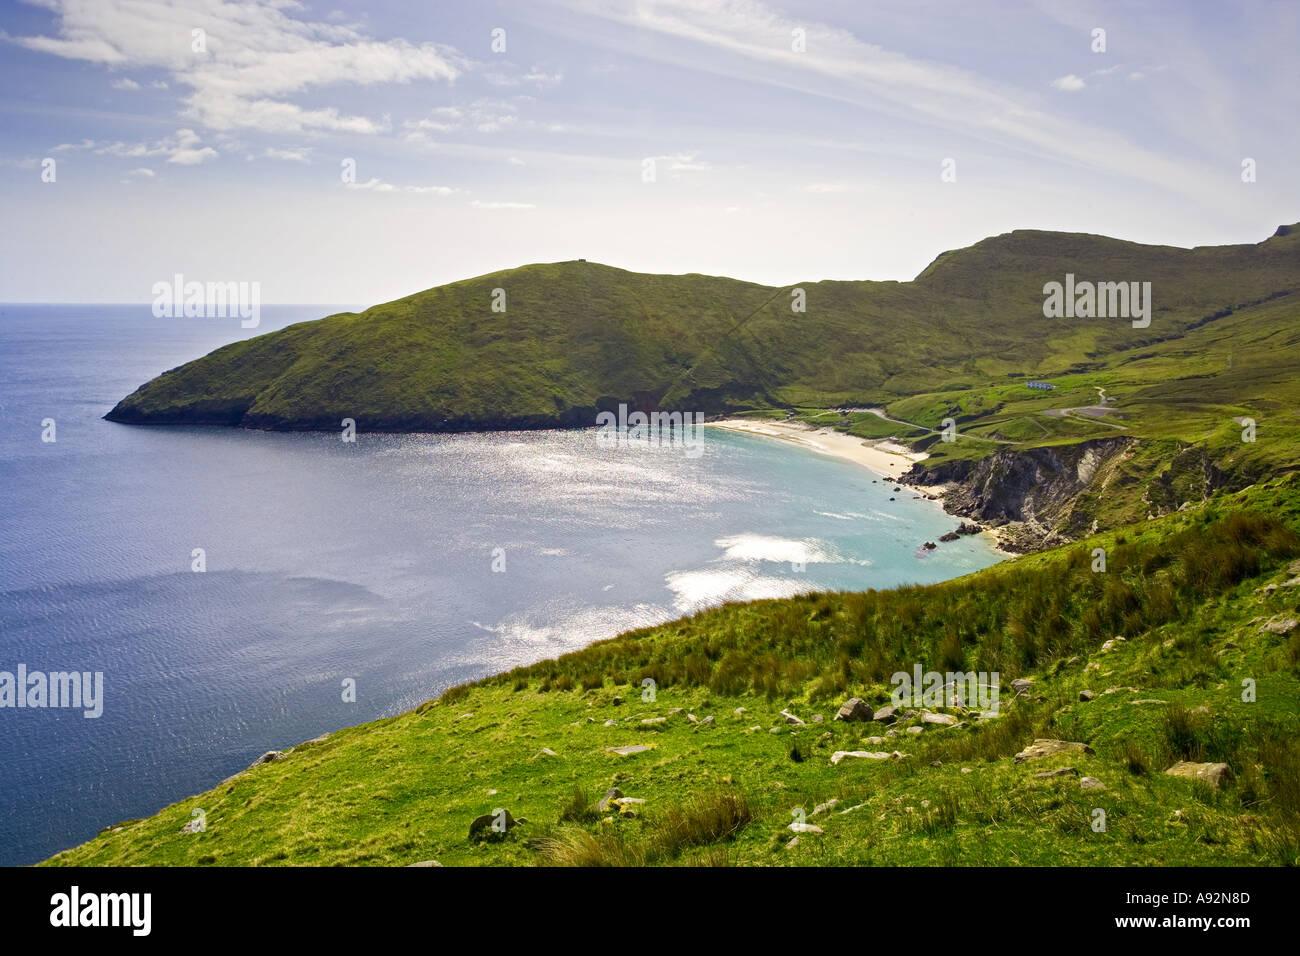 Keel Beach Achill Island County Mayo Eire - Stock Image